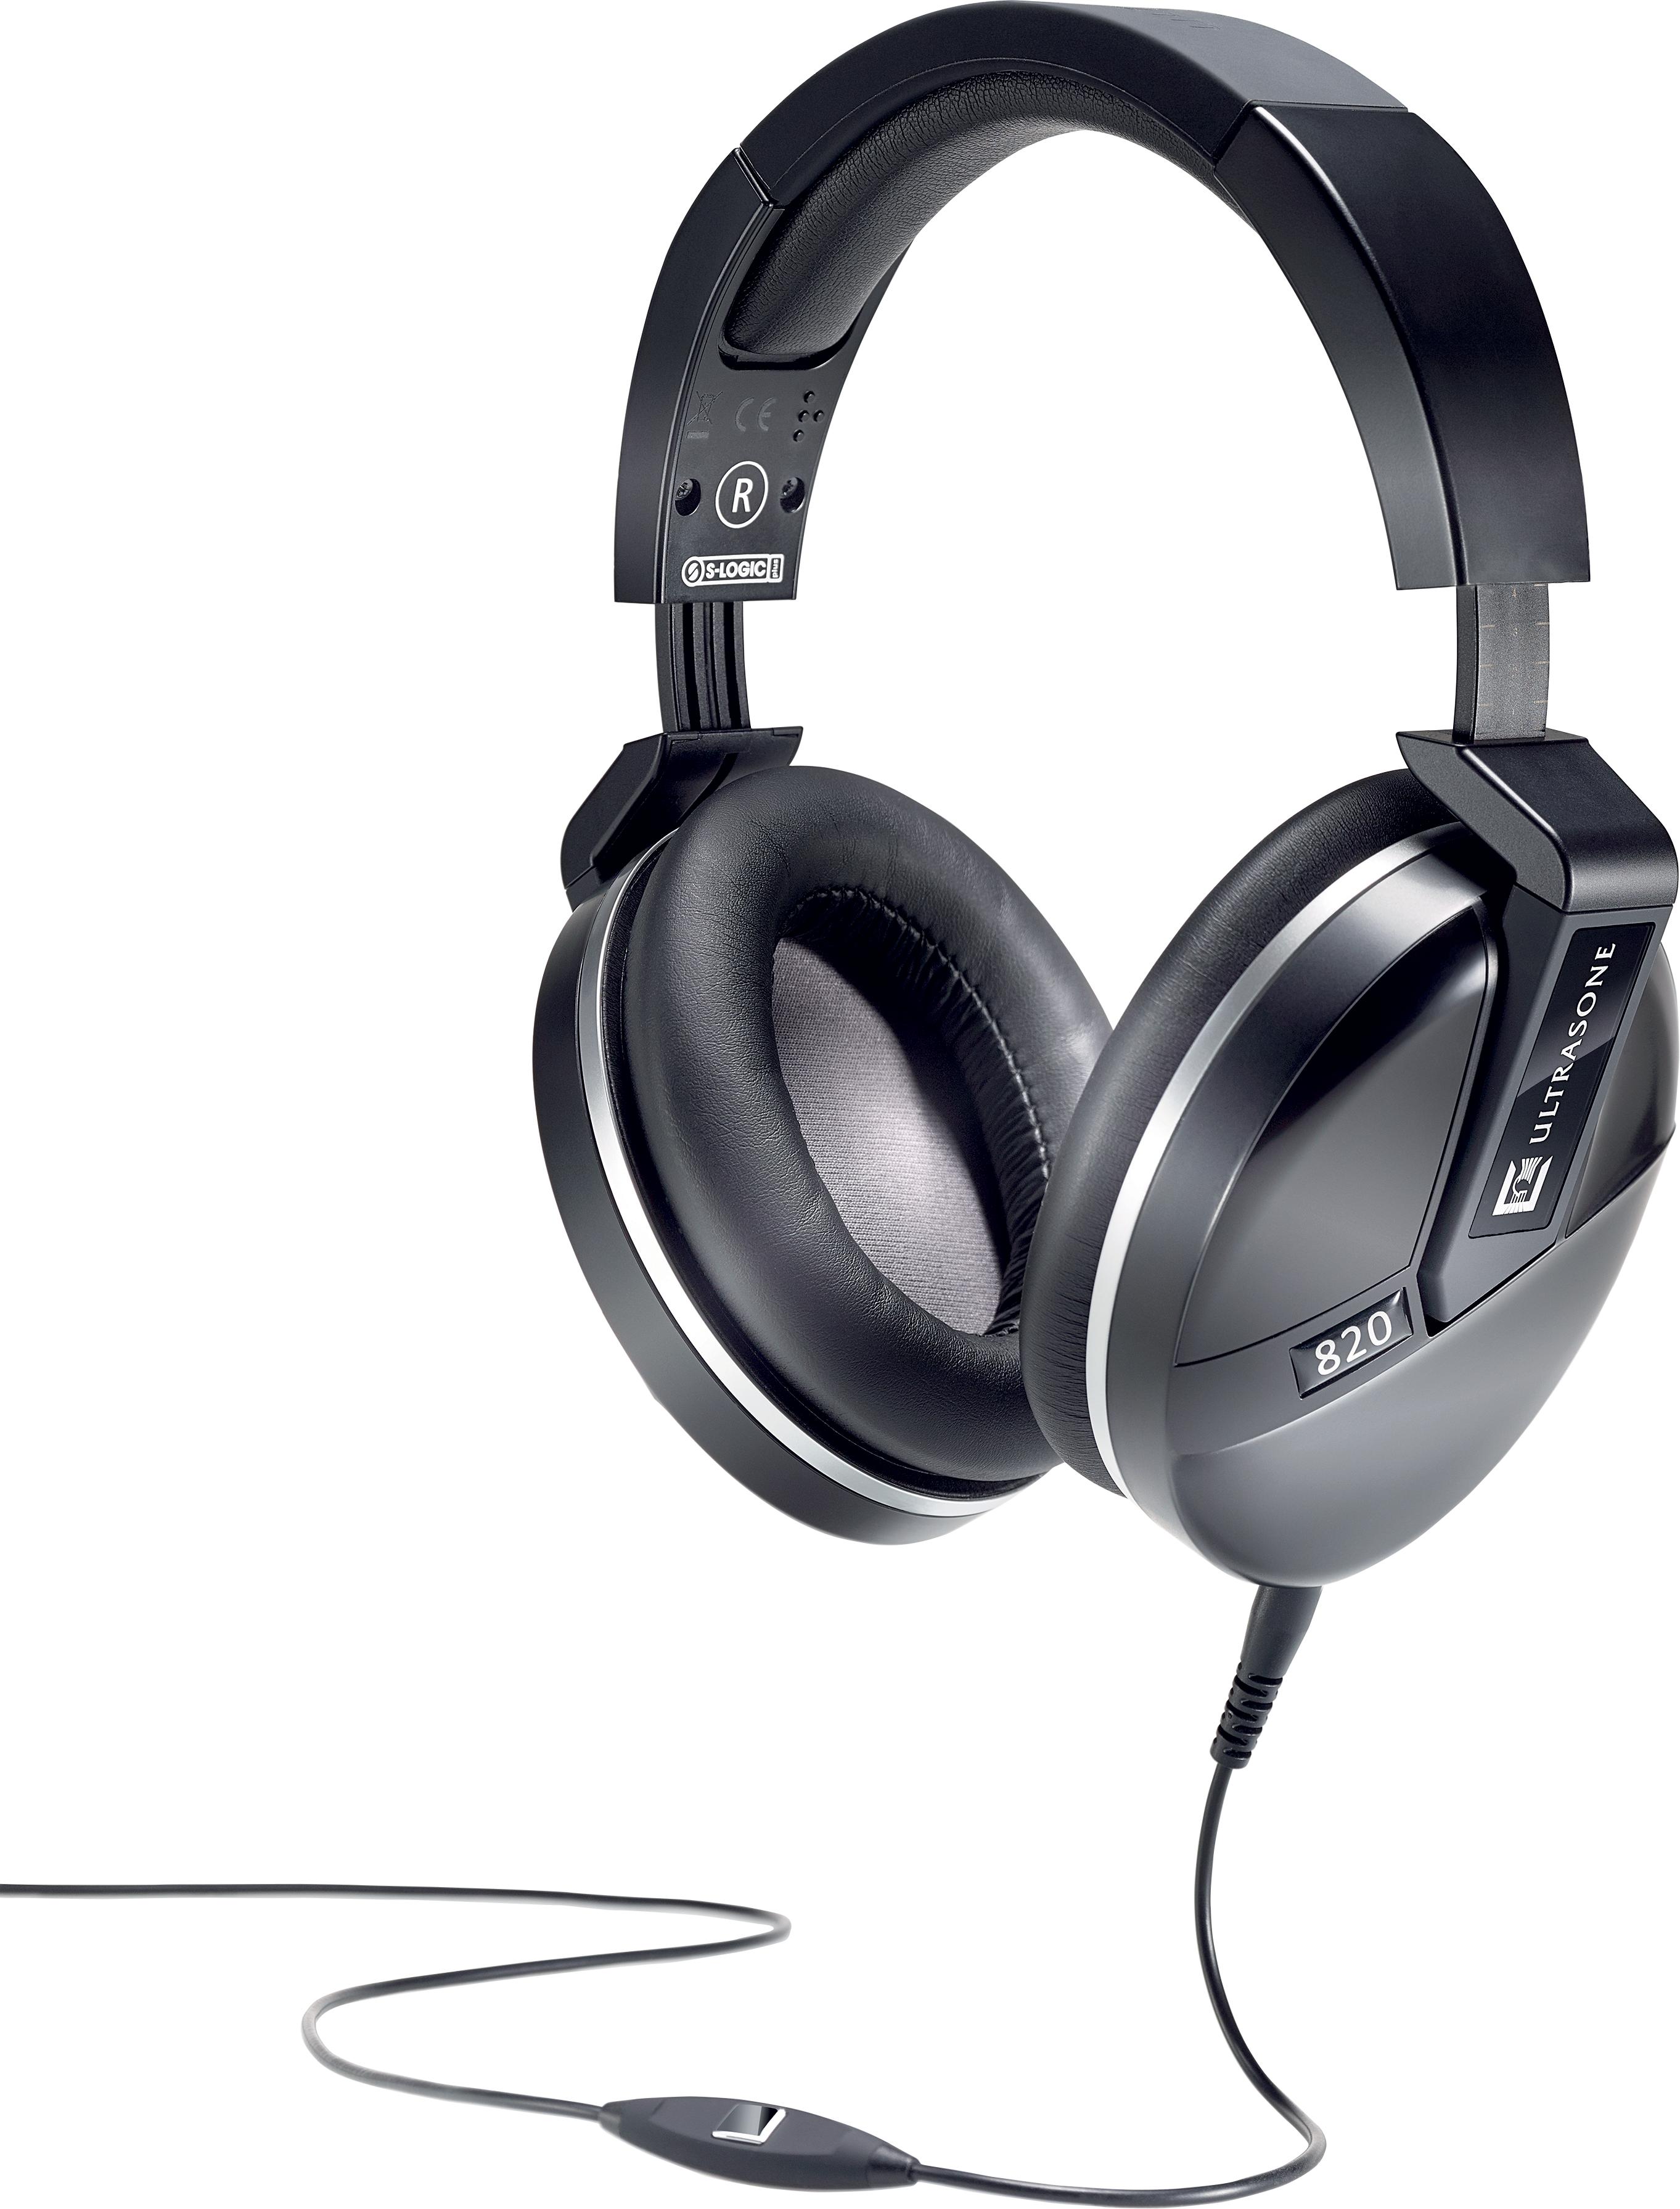 audio - CASQUES, ECOUTEURS, EAR MONITOR - CASQUES - ULTRASONE - ULTPER820 - Royez Musik